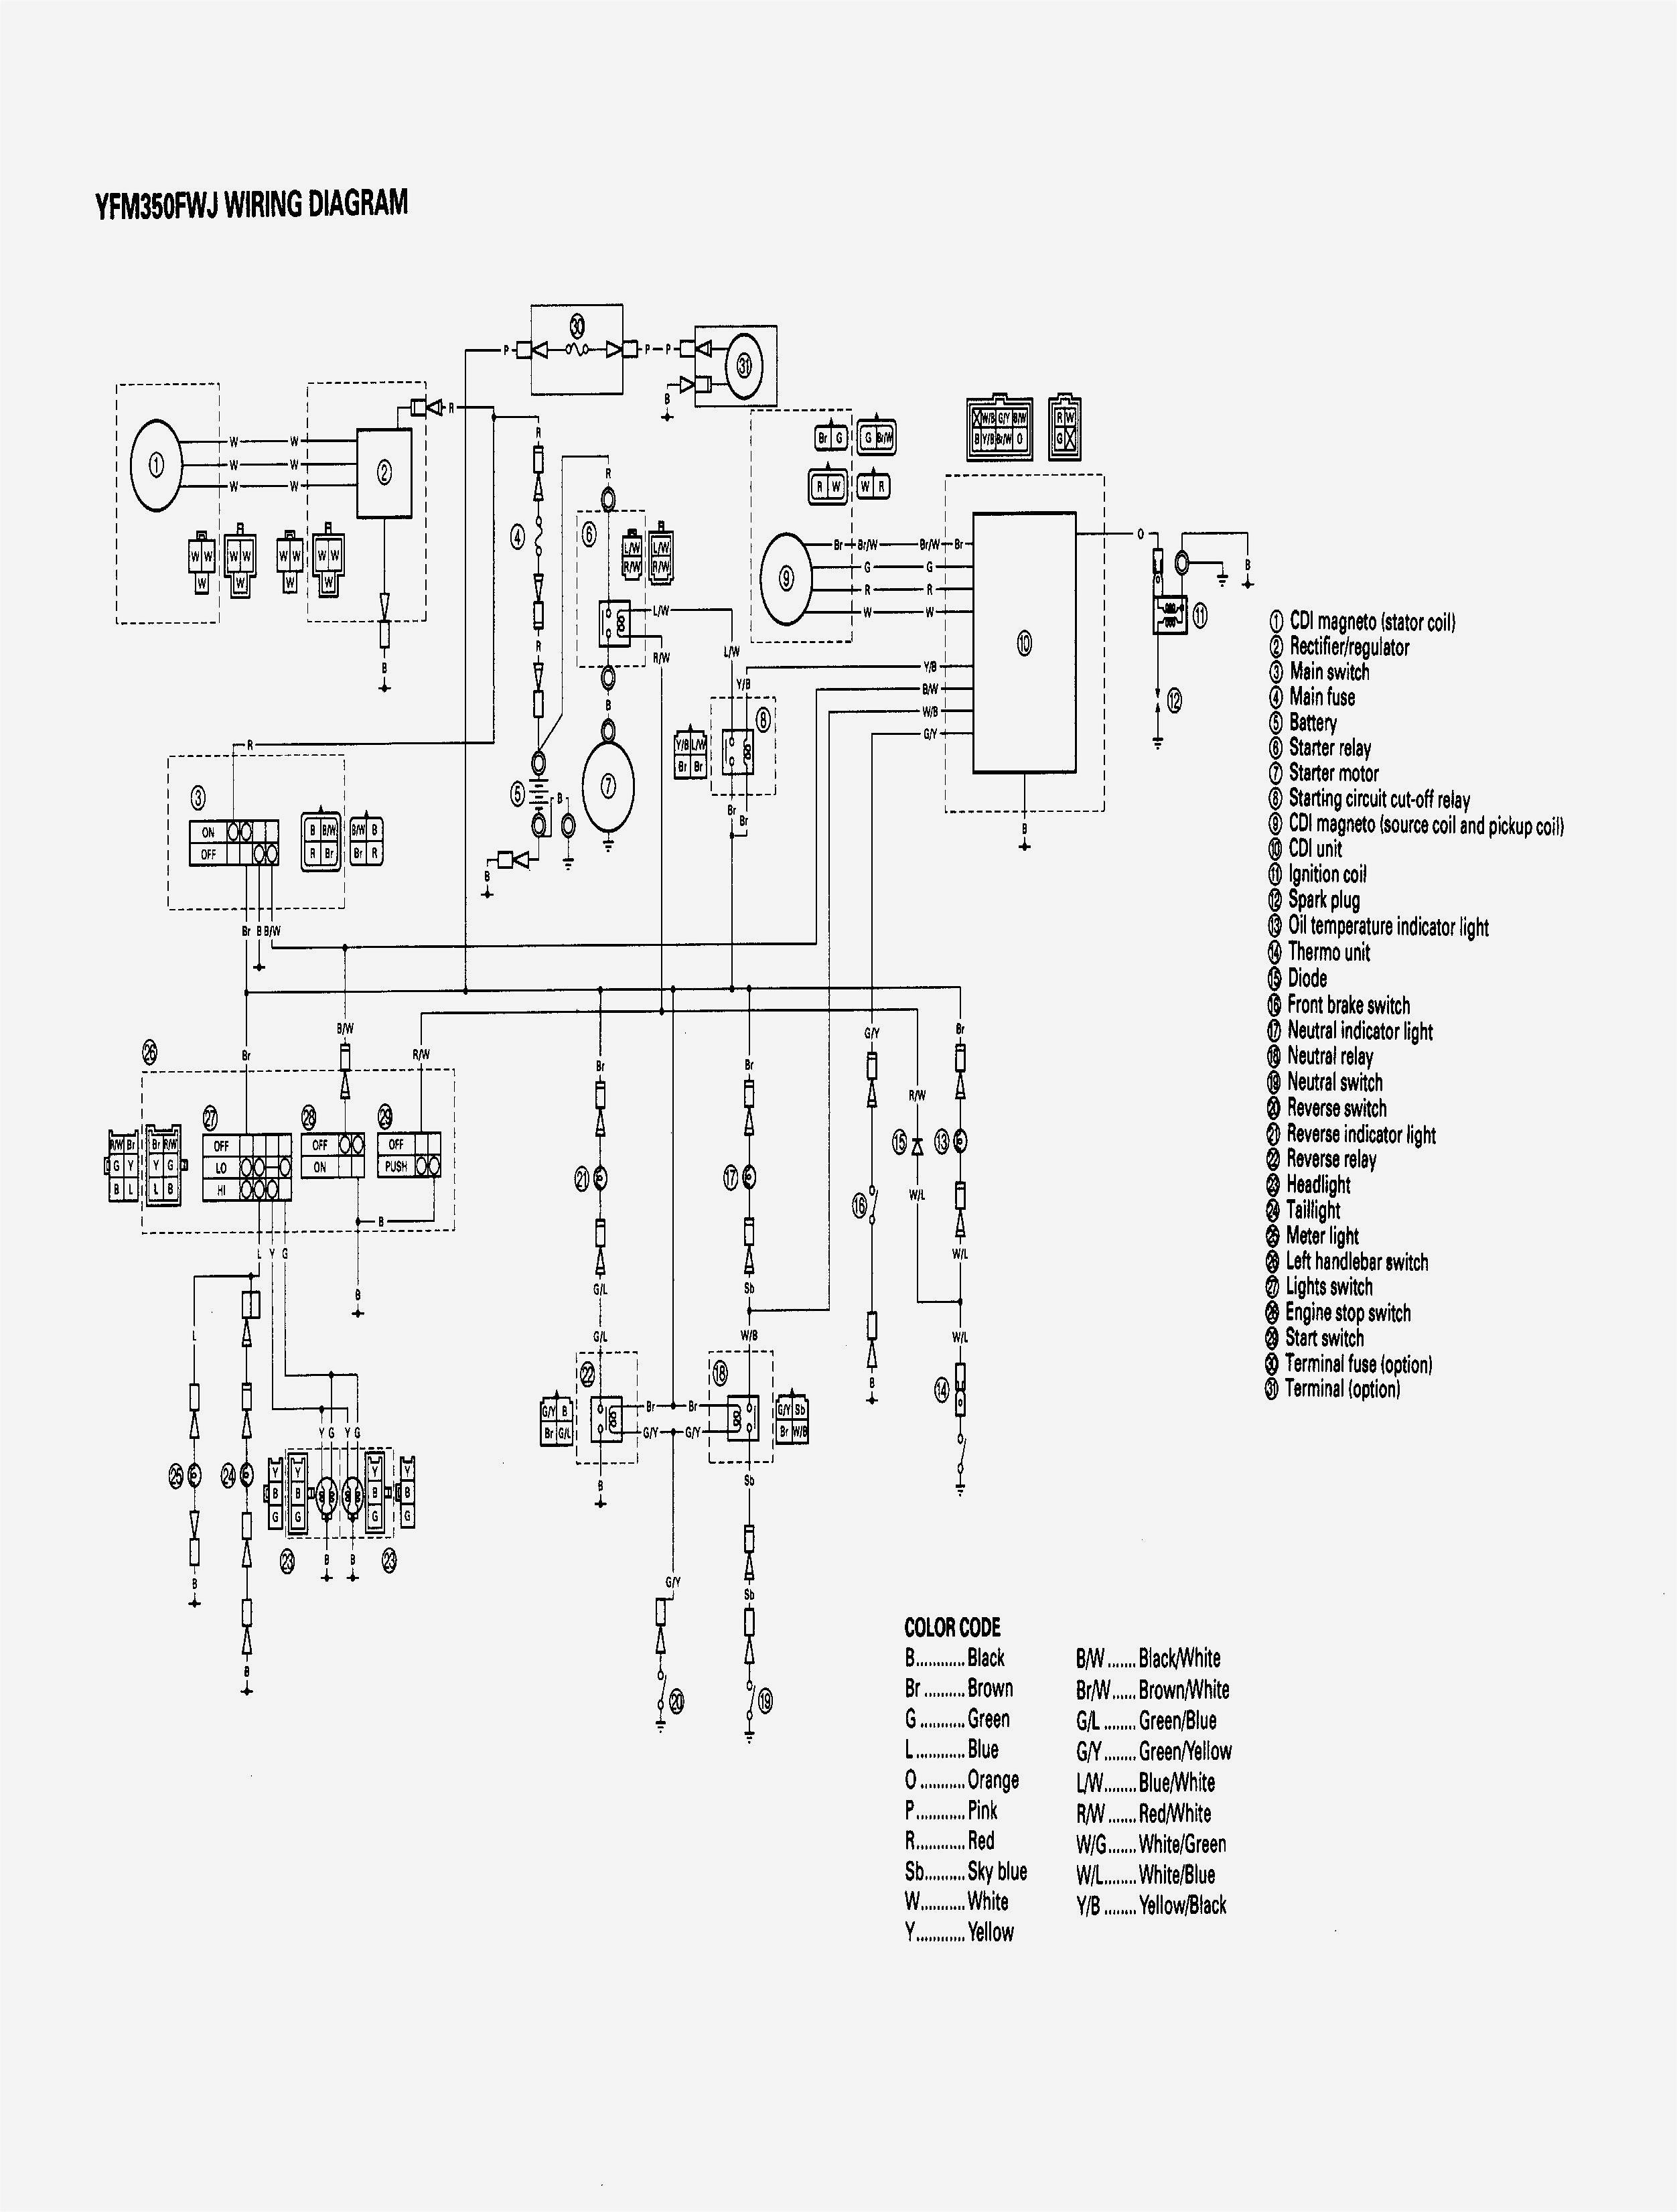 Fresh Wiring Diagram Yamaha Aerox Diagrams Digramssample Diagramimages Wiringdiagramsample Wiringdiagram Check More At Https Nos Diagram Big Bear Kodiak